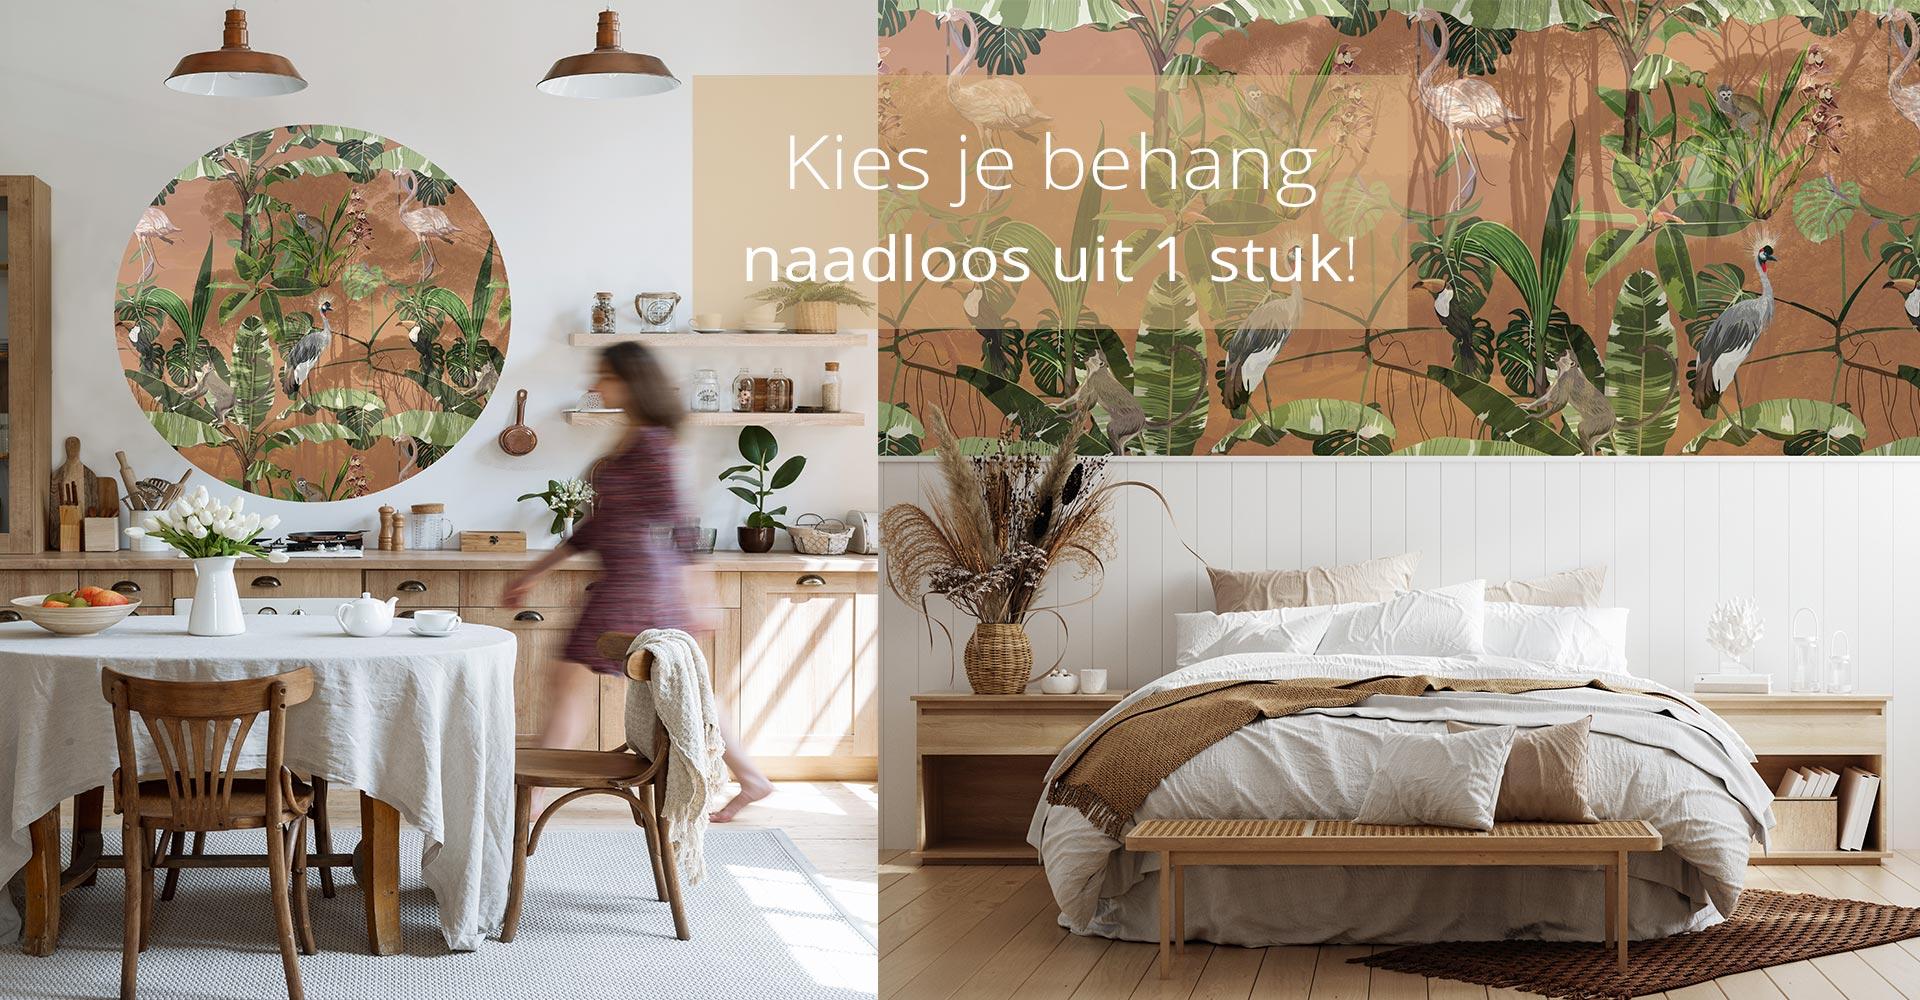 Kies-je-behang-terracotta